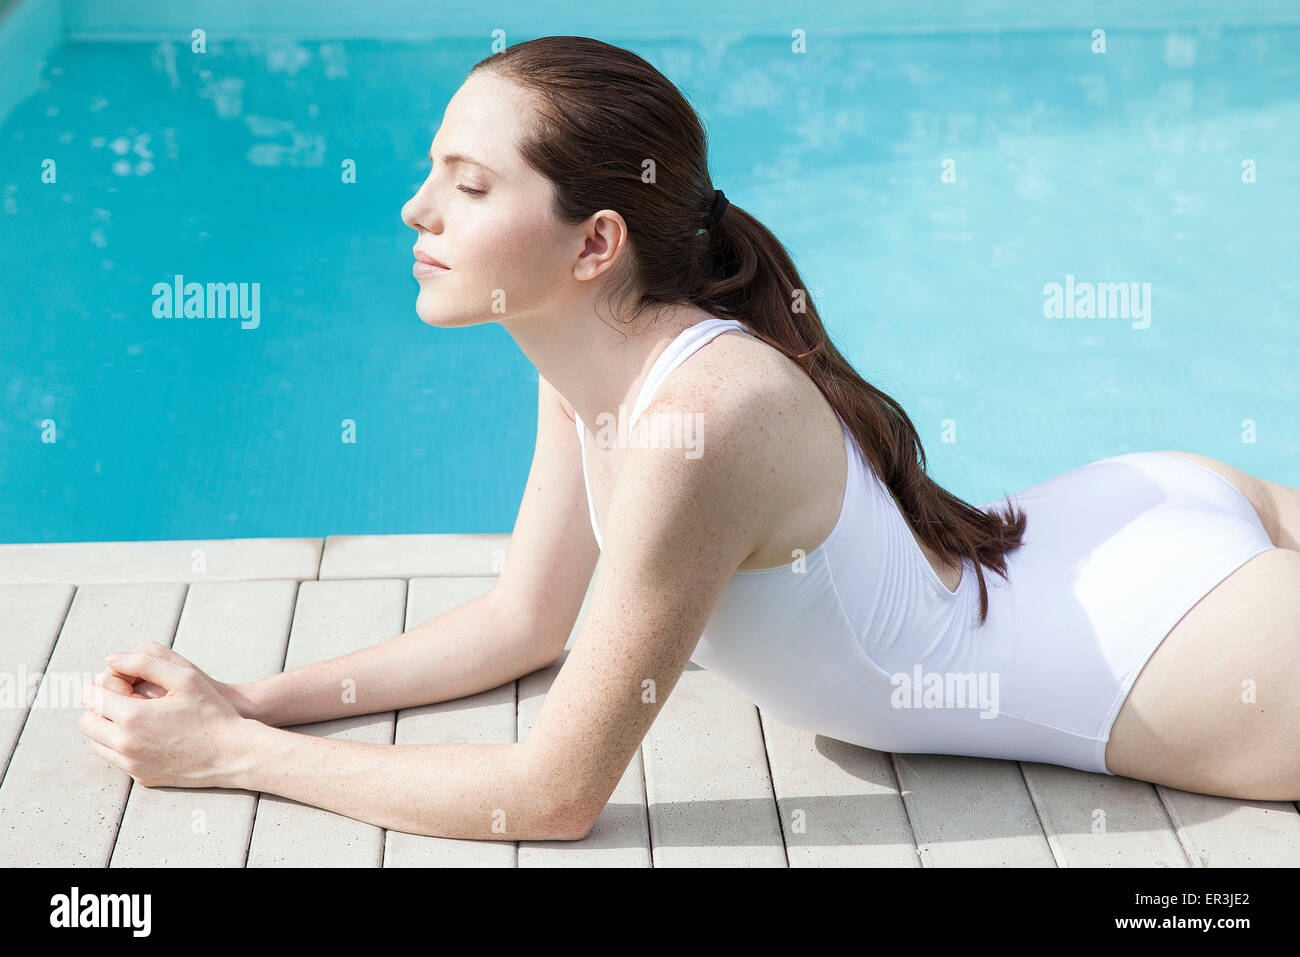 Junge Frau mit geschlossenen Augen neben Pool Sonnenbaden Stockbild